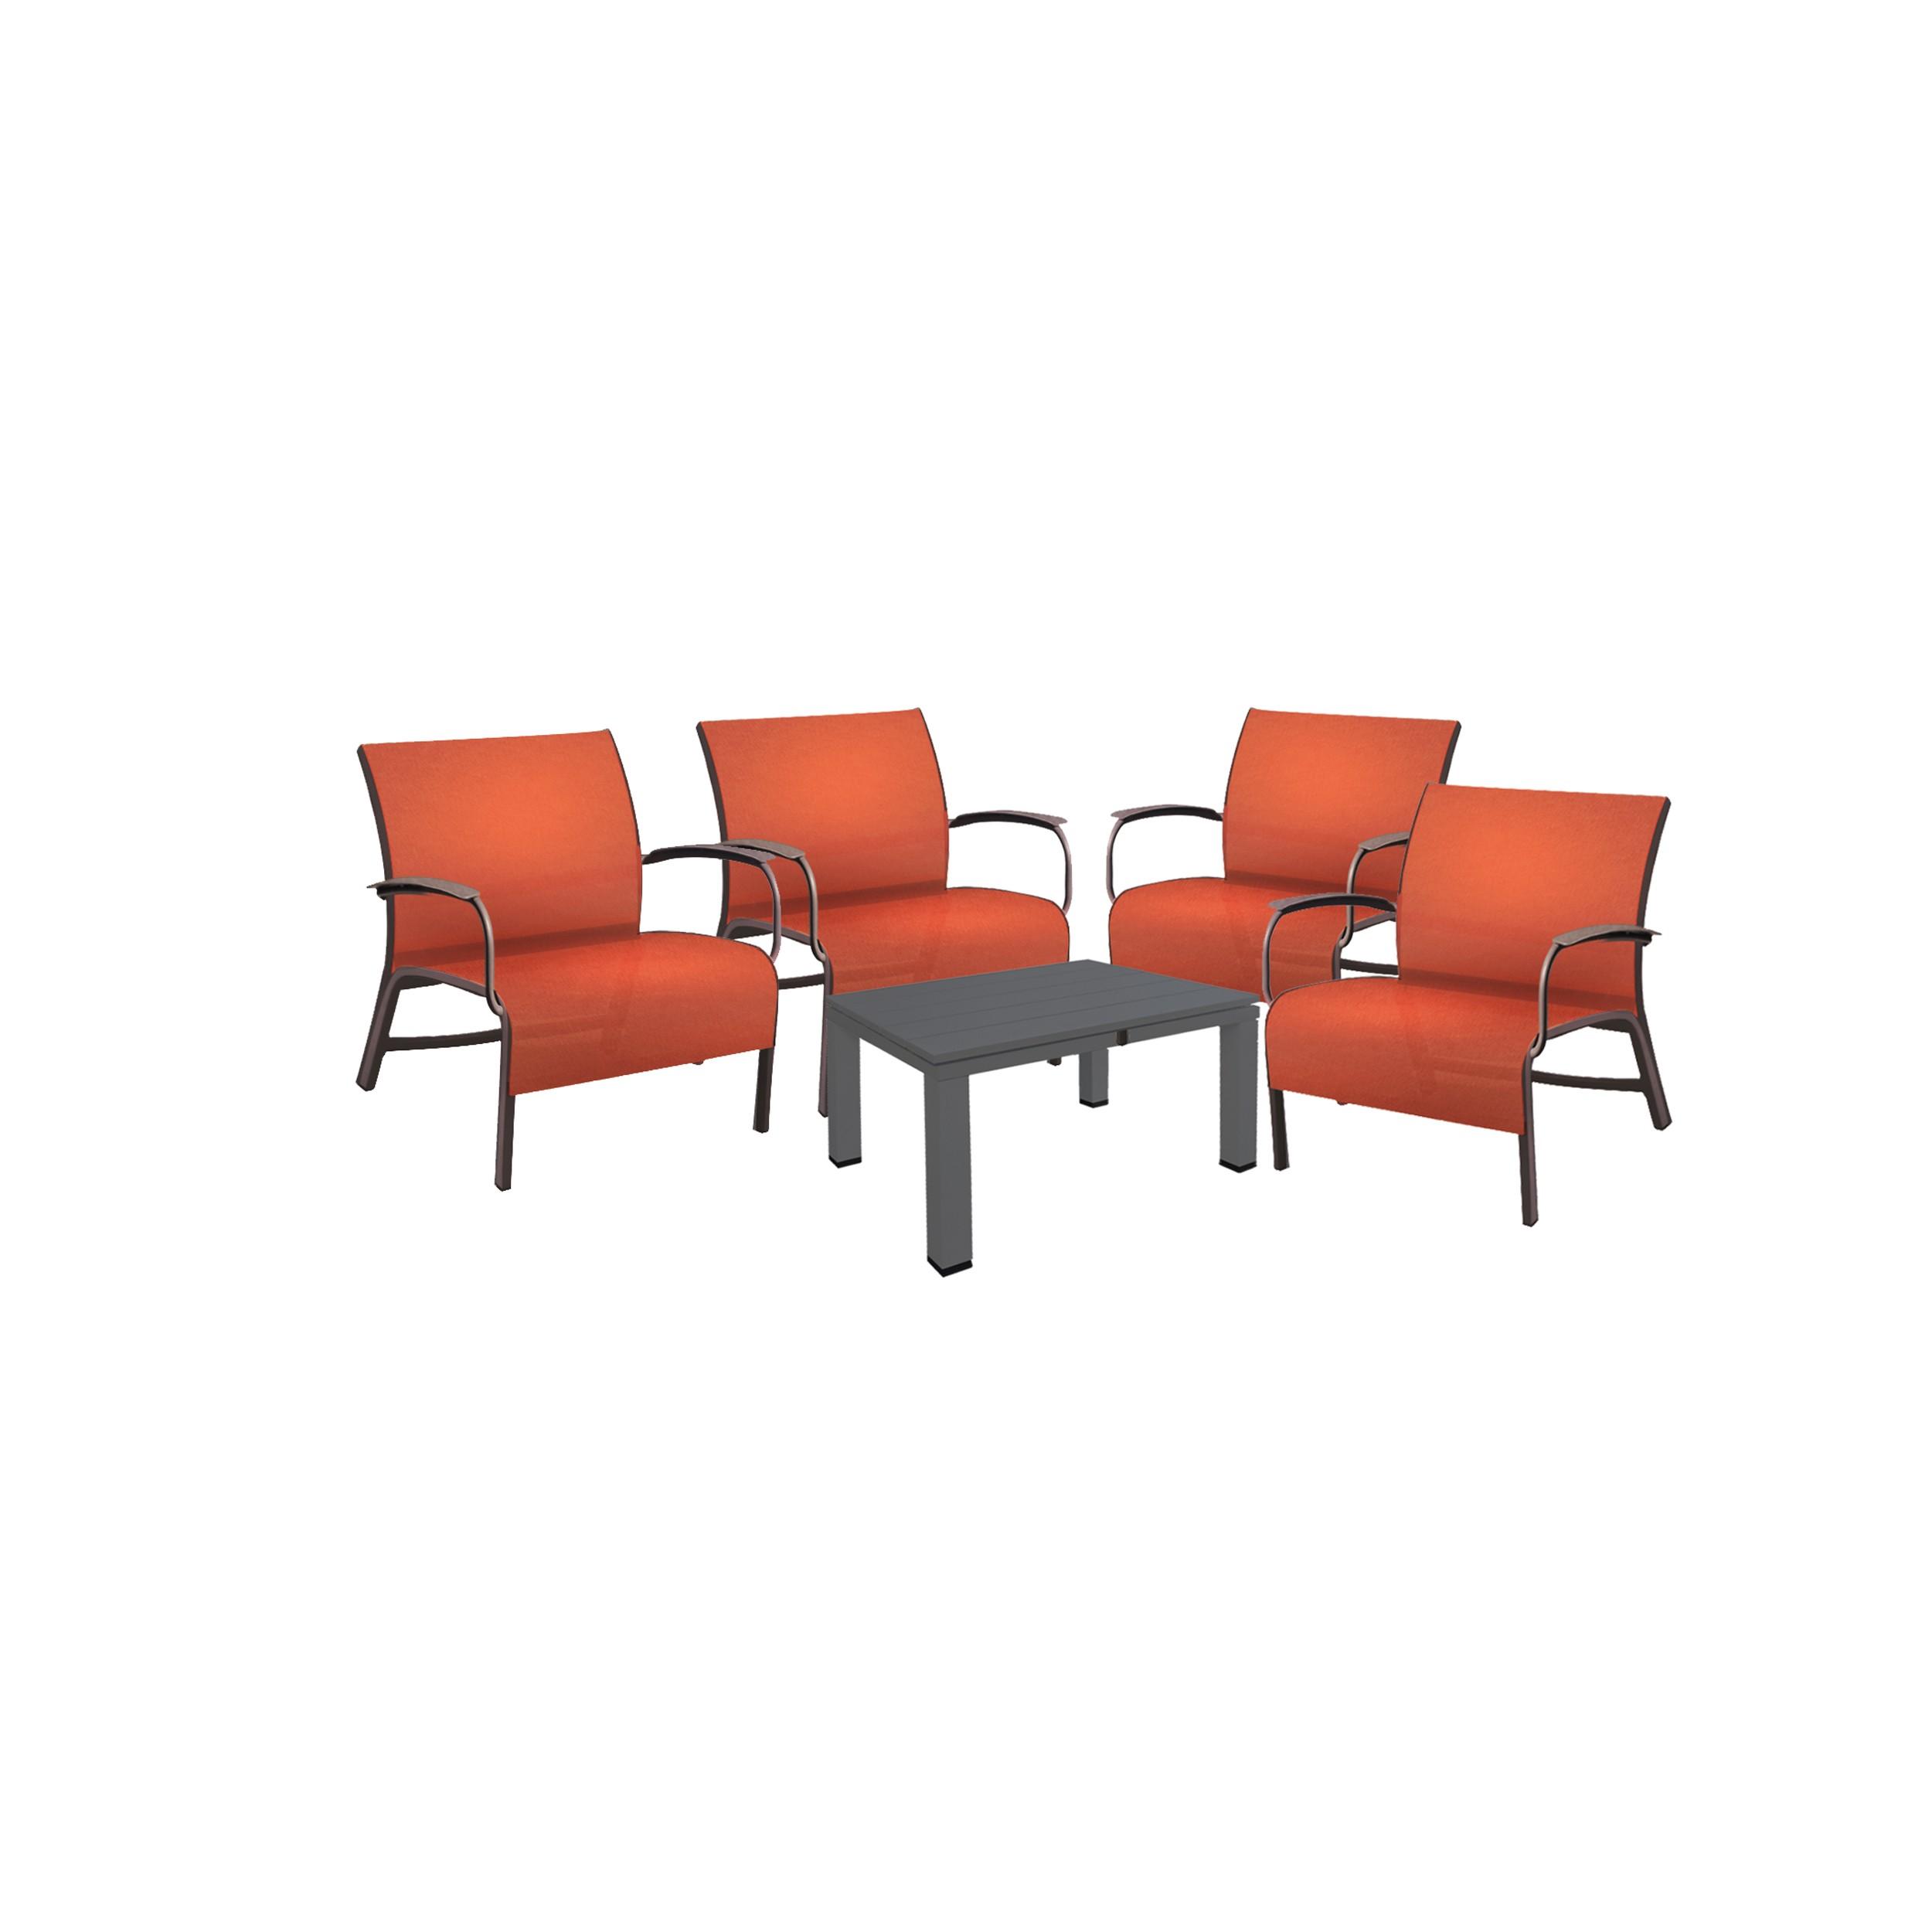 salon de jardin santa fe terracotta choisissez nos salons de jardin santa fe terracotta. Black Bedroom Furniture Sets. Home Design Ideas